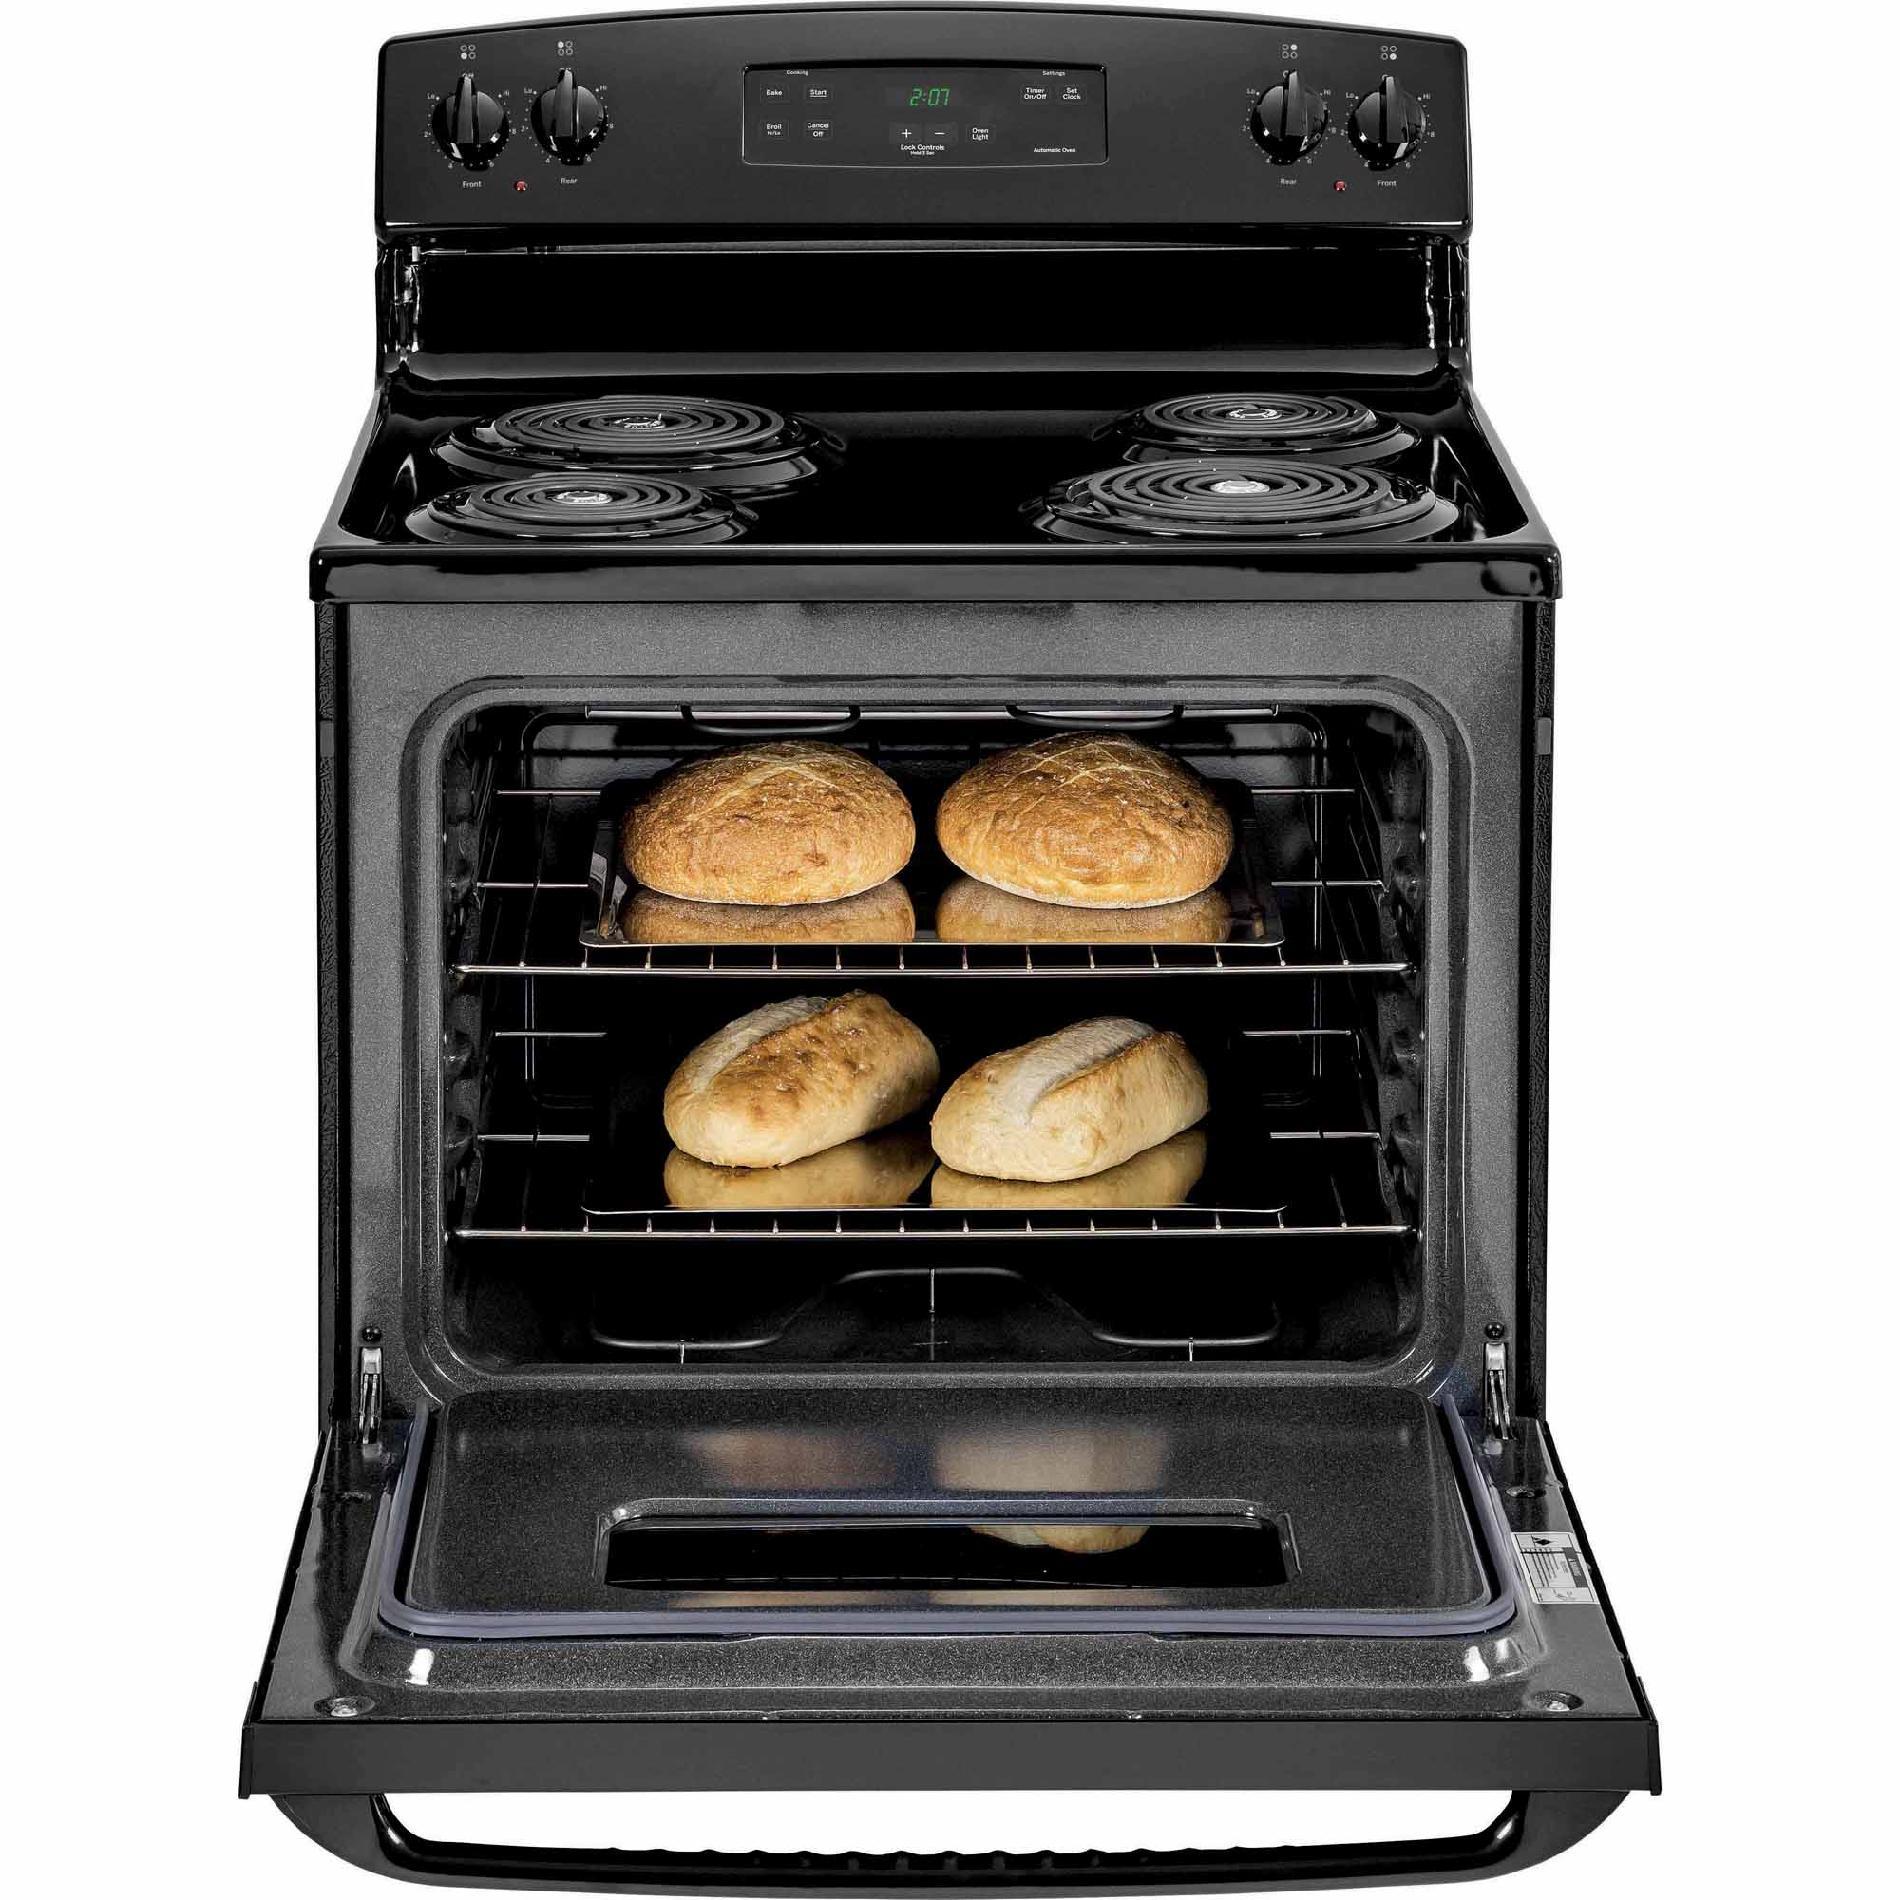 GE Appliances JBS27DFBB 5.0 cu. ft. Electric Range - Black